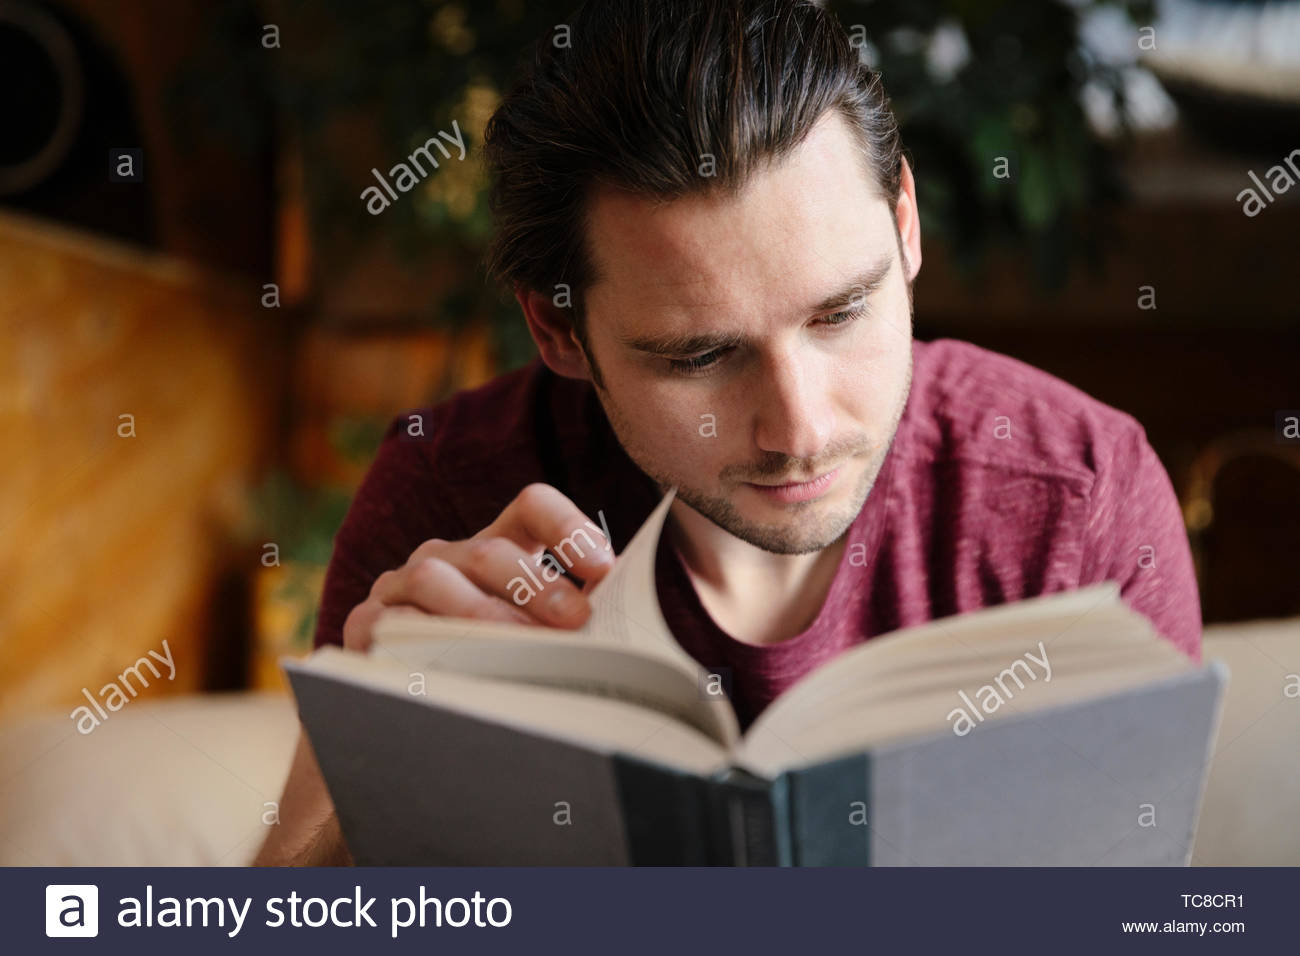 Serene man reading book Photo Stock